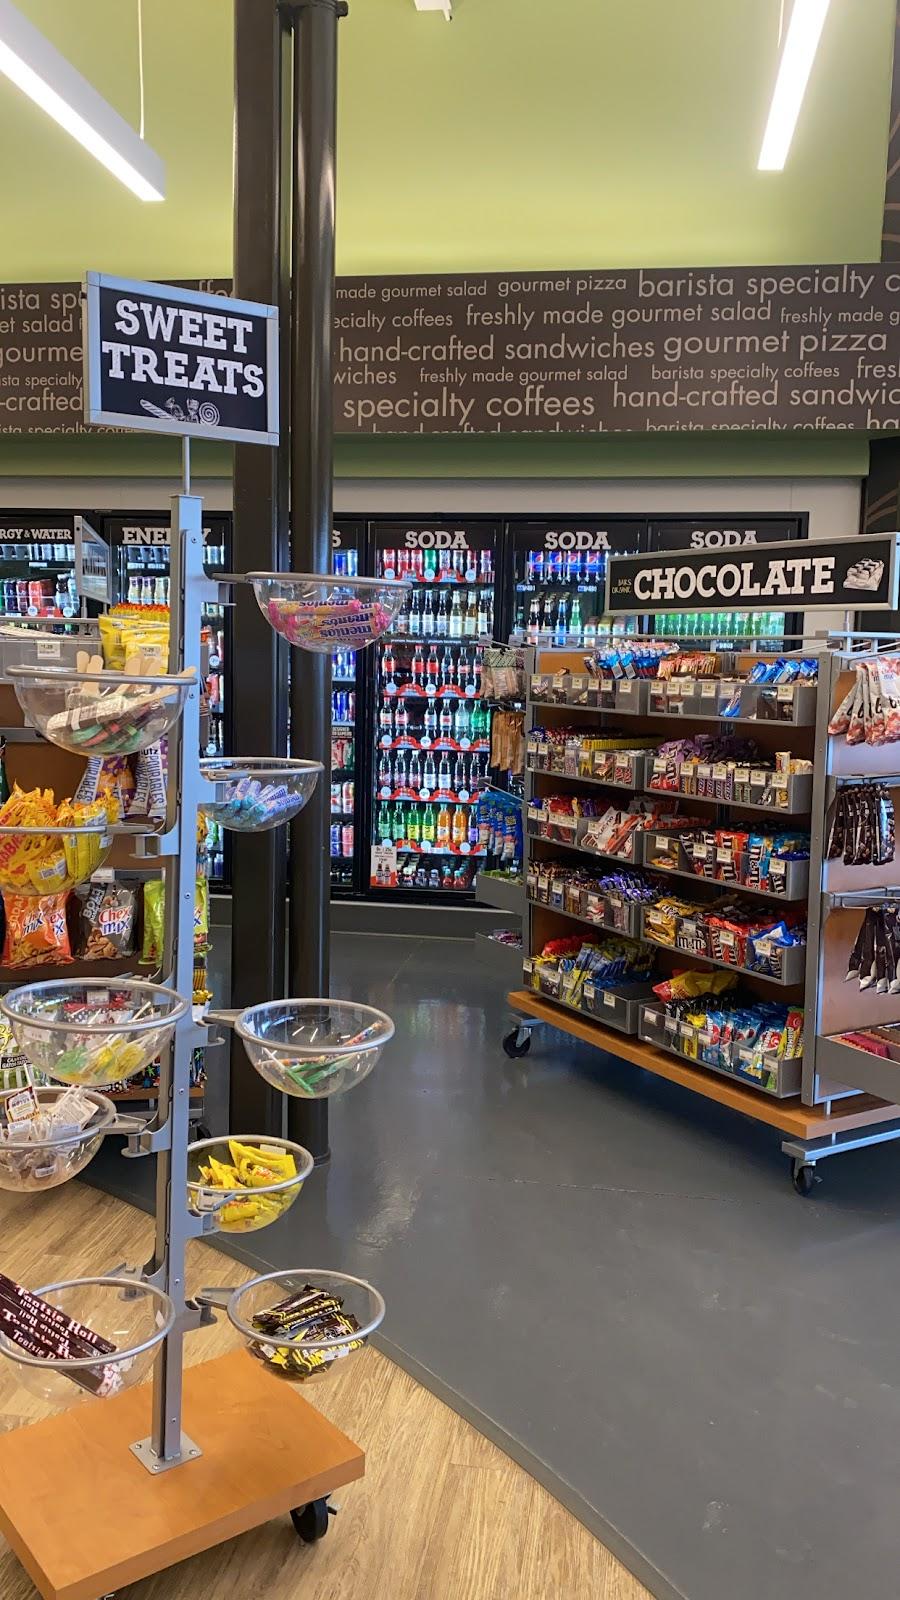 American Natural Valencia - convenience store  | Photo 2 of 10 | Address: 5051 Adair Ave, Valencia, PA 16059, USA | Phone: (724) 364-8500